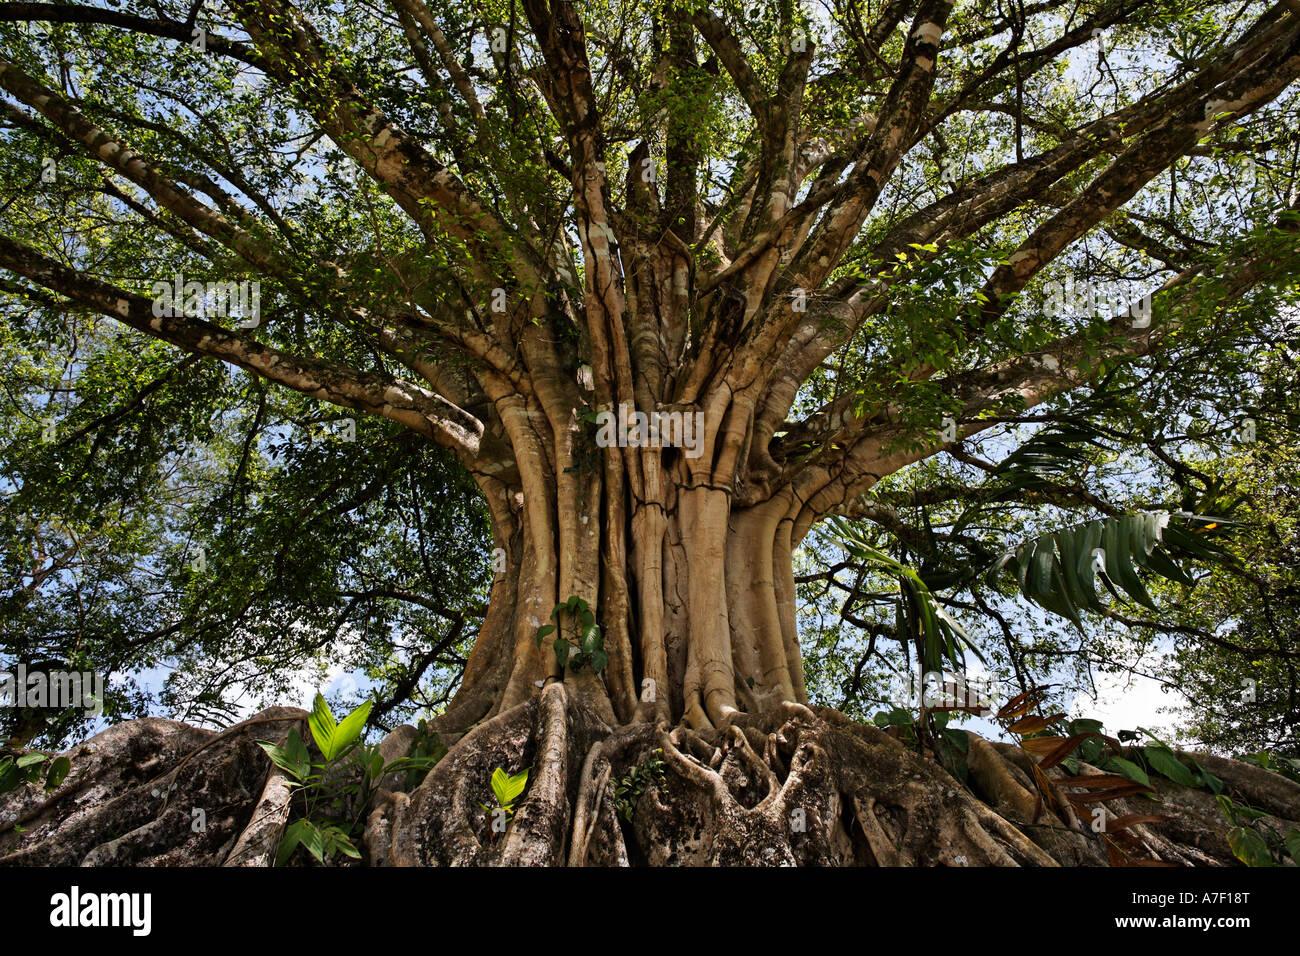 Banyan Tree, Ficus Benghalensis, Costa Rica Stock Photo, Royalty ...